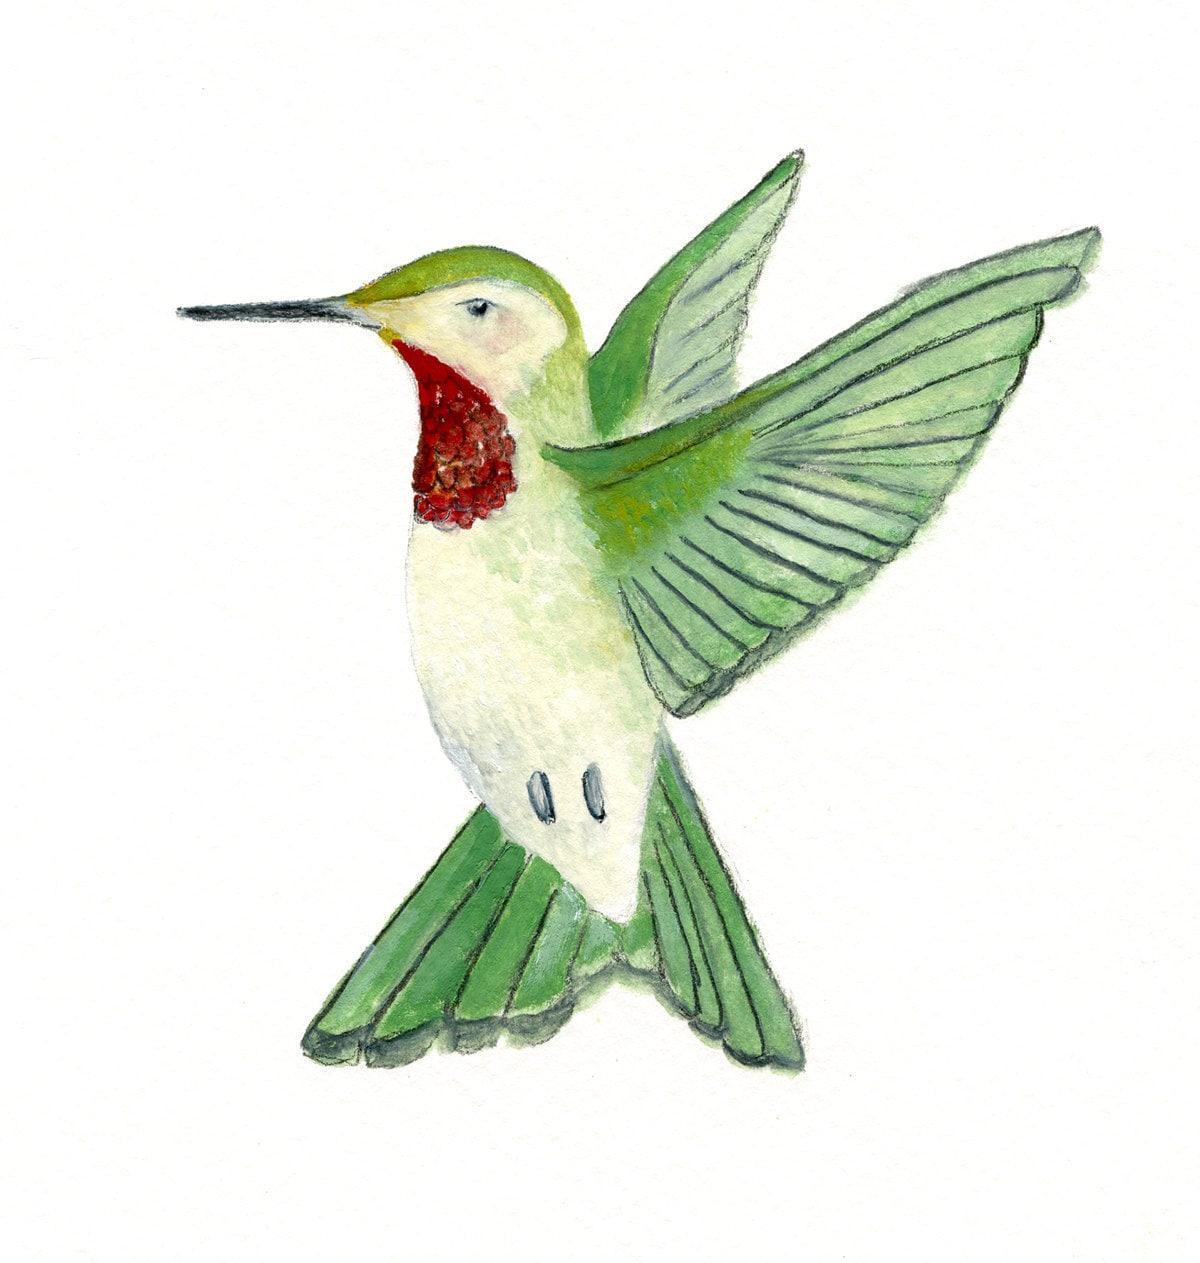 Hummingbird Archival Print Of Original Oil By LittleBeanPrints